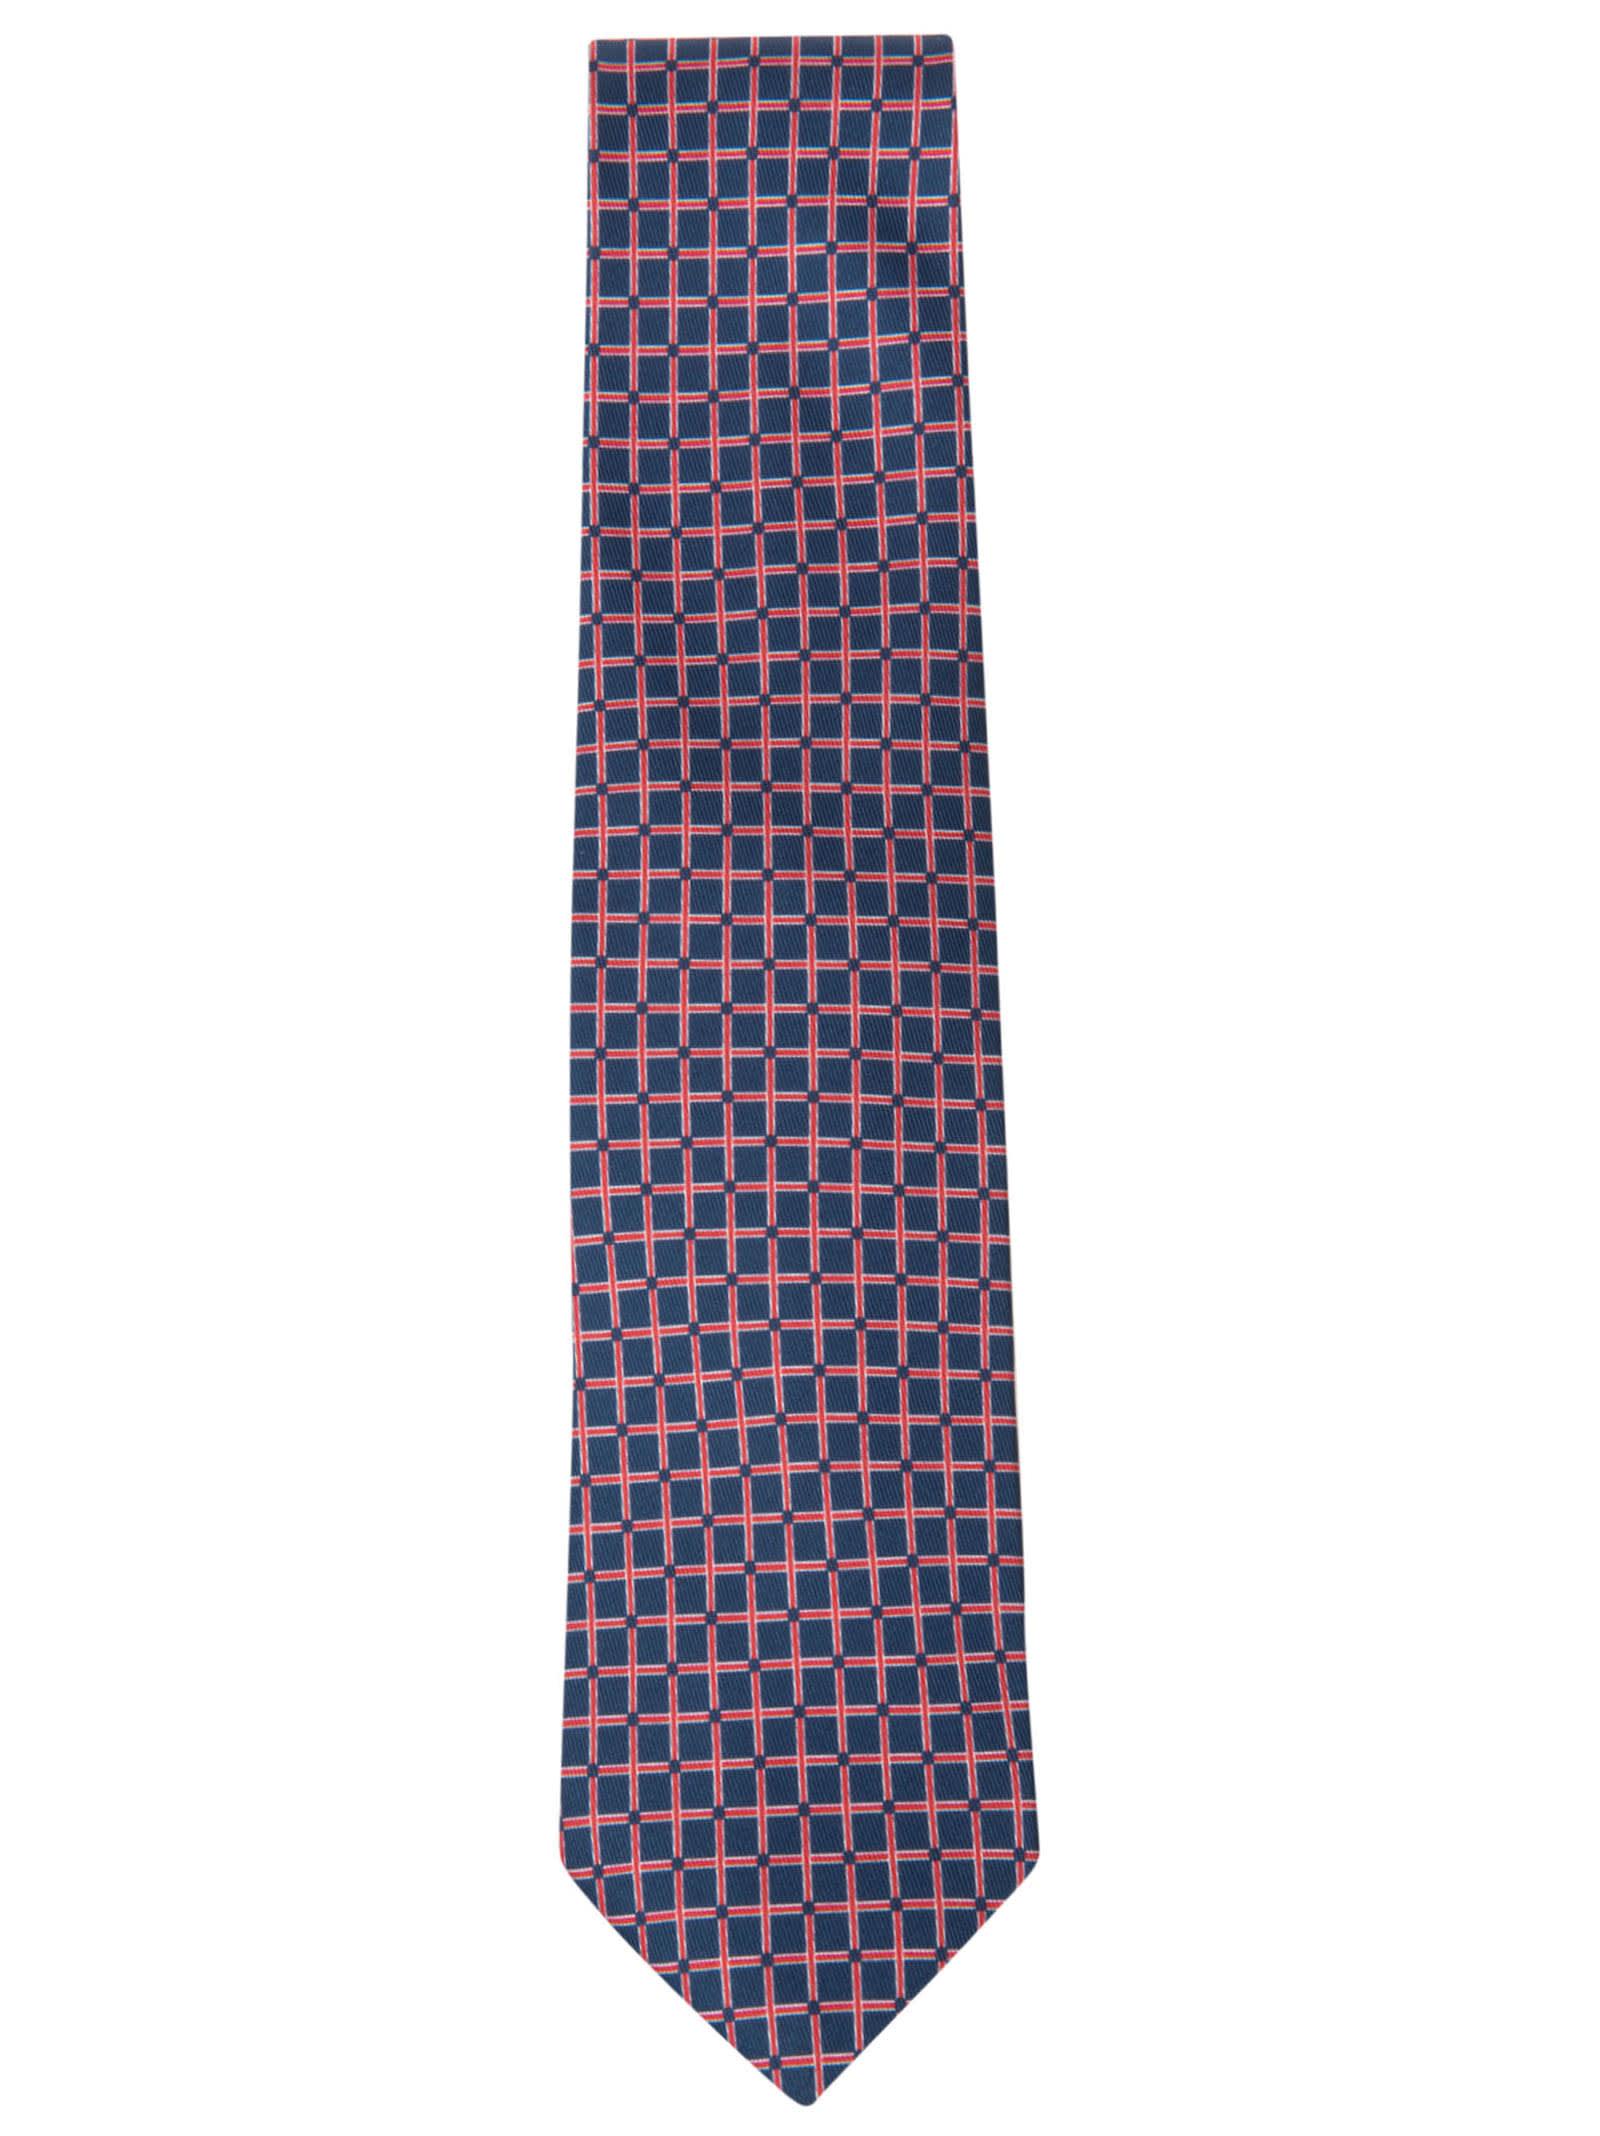 Printed Neck Tie